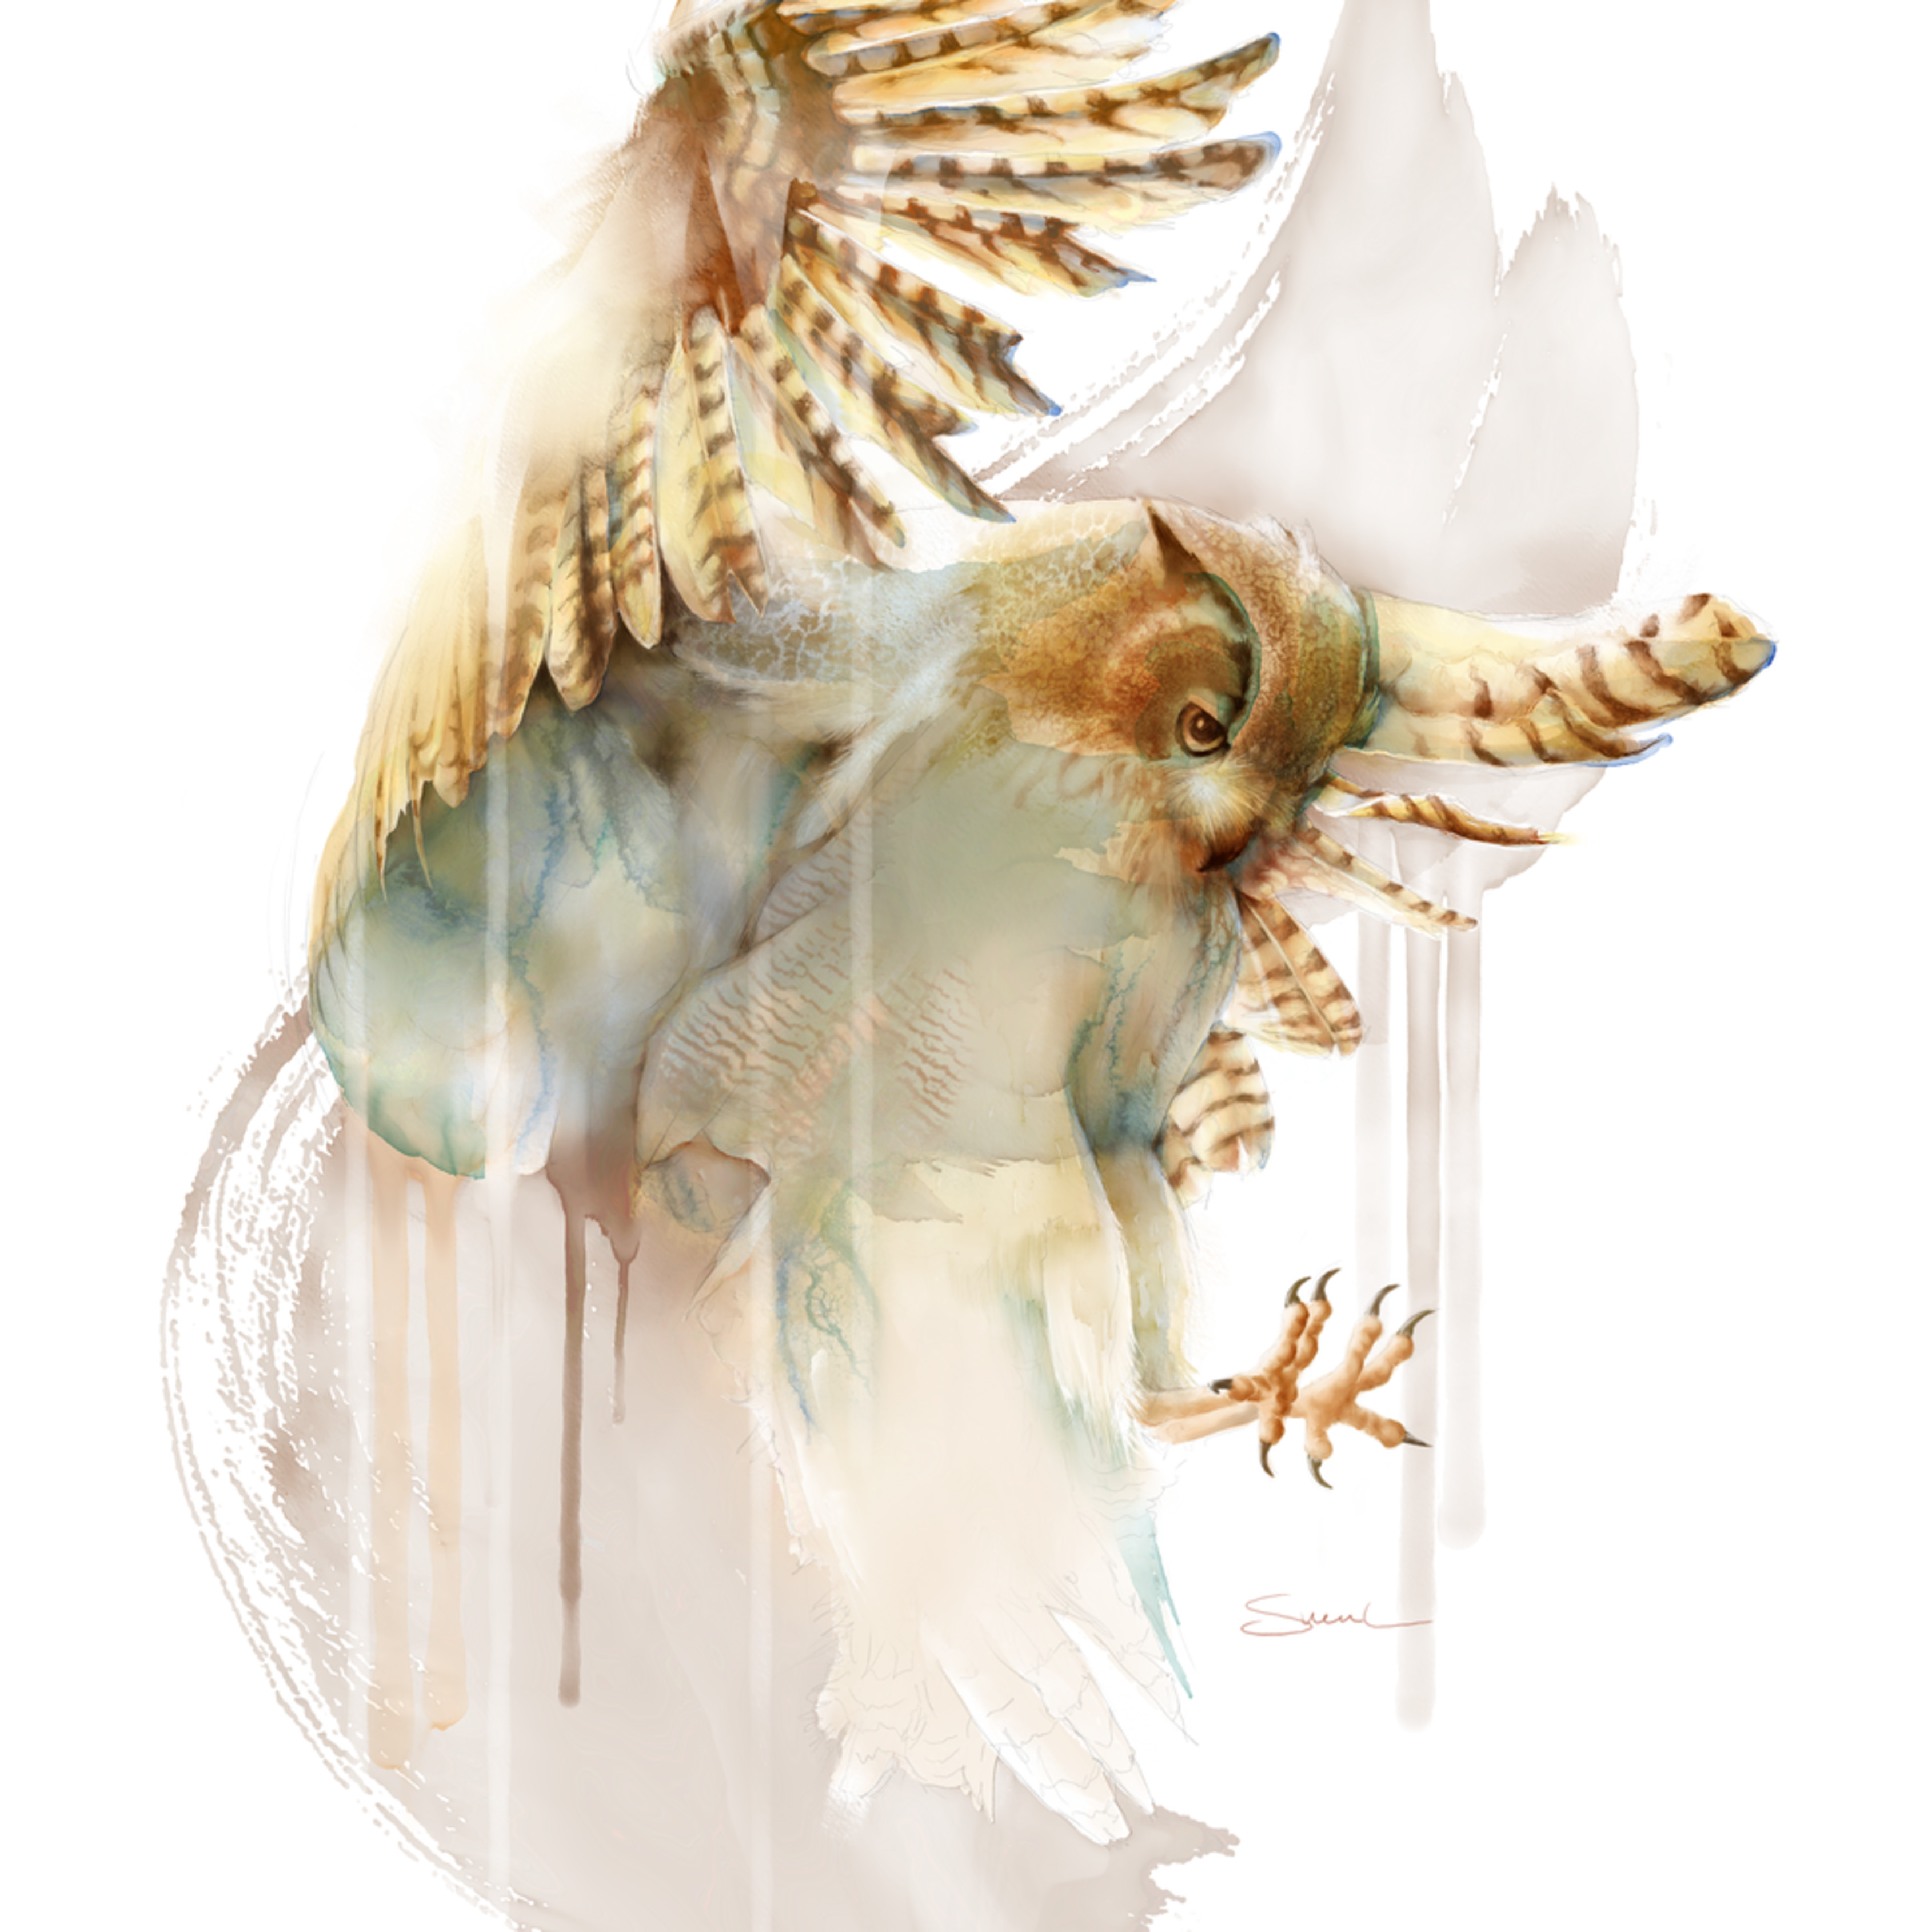 Owl 2 mixedmedia hmoce6